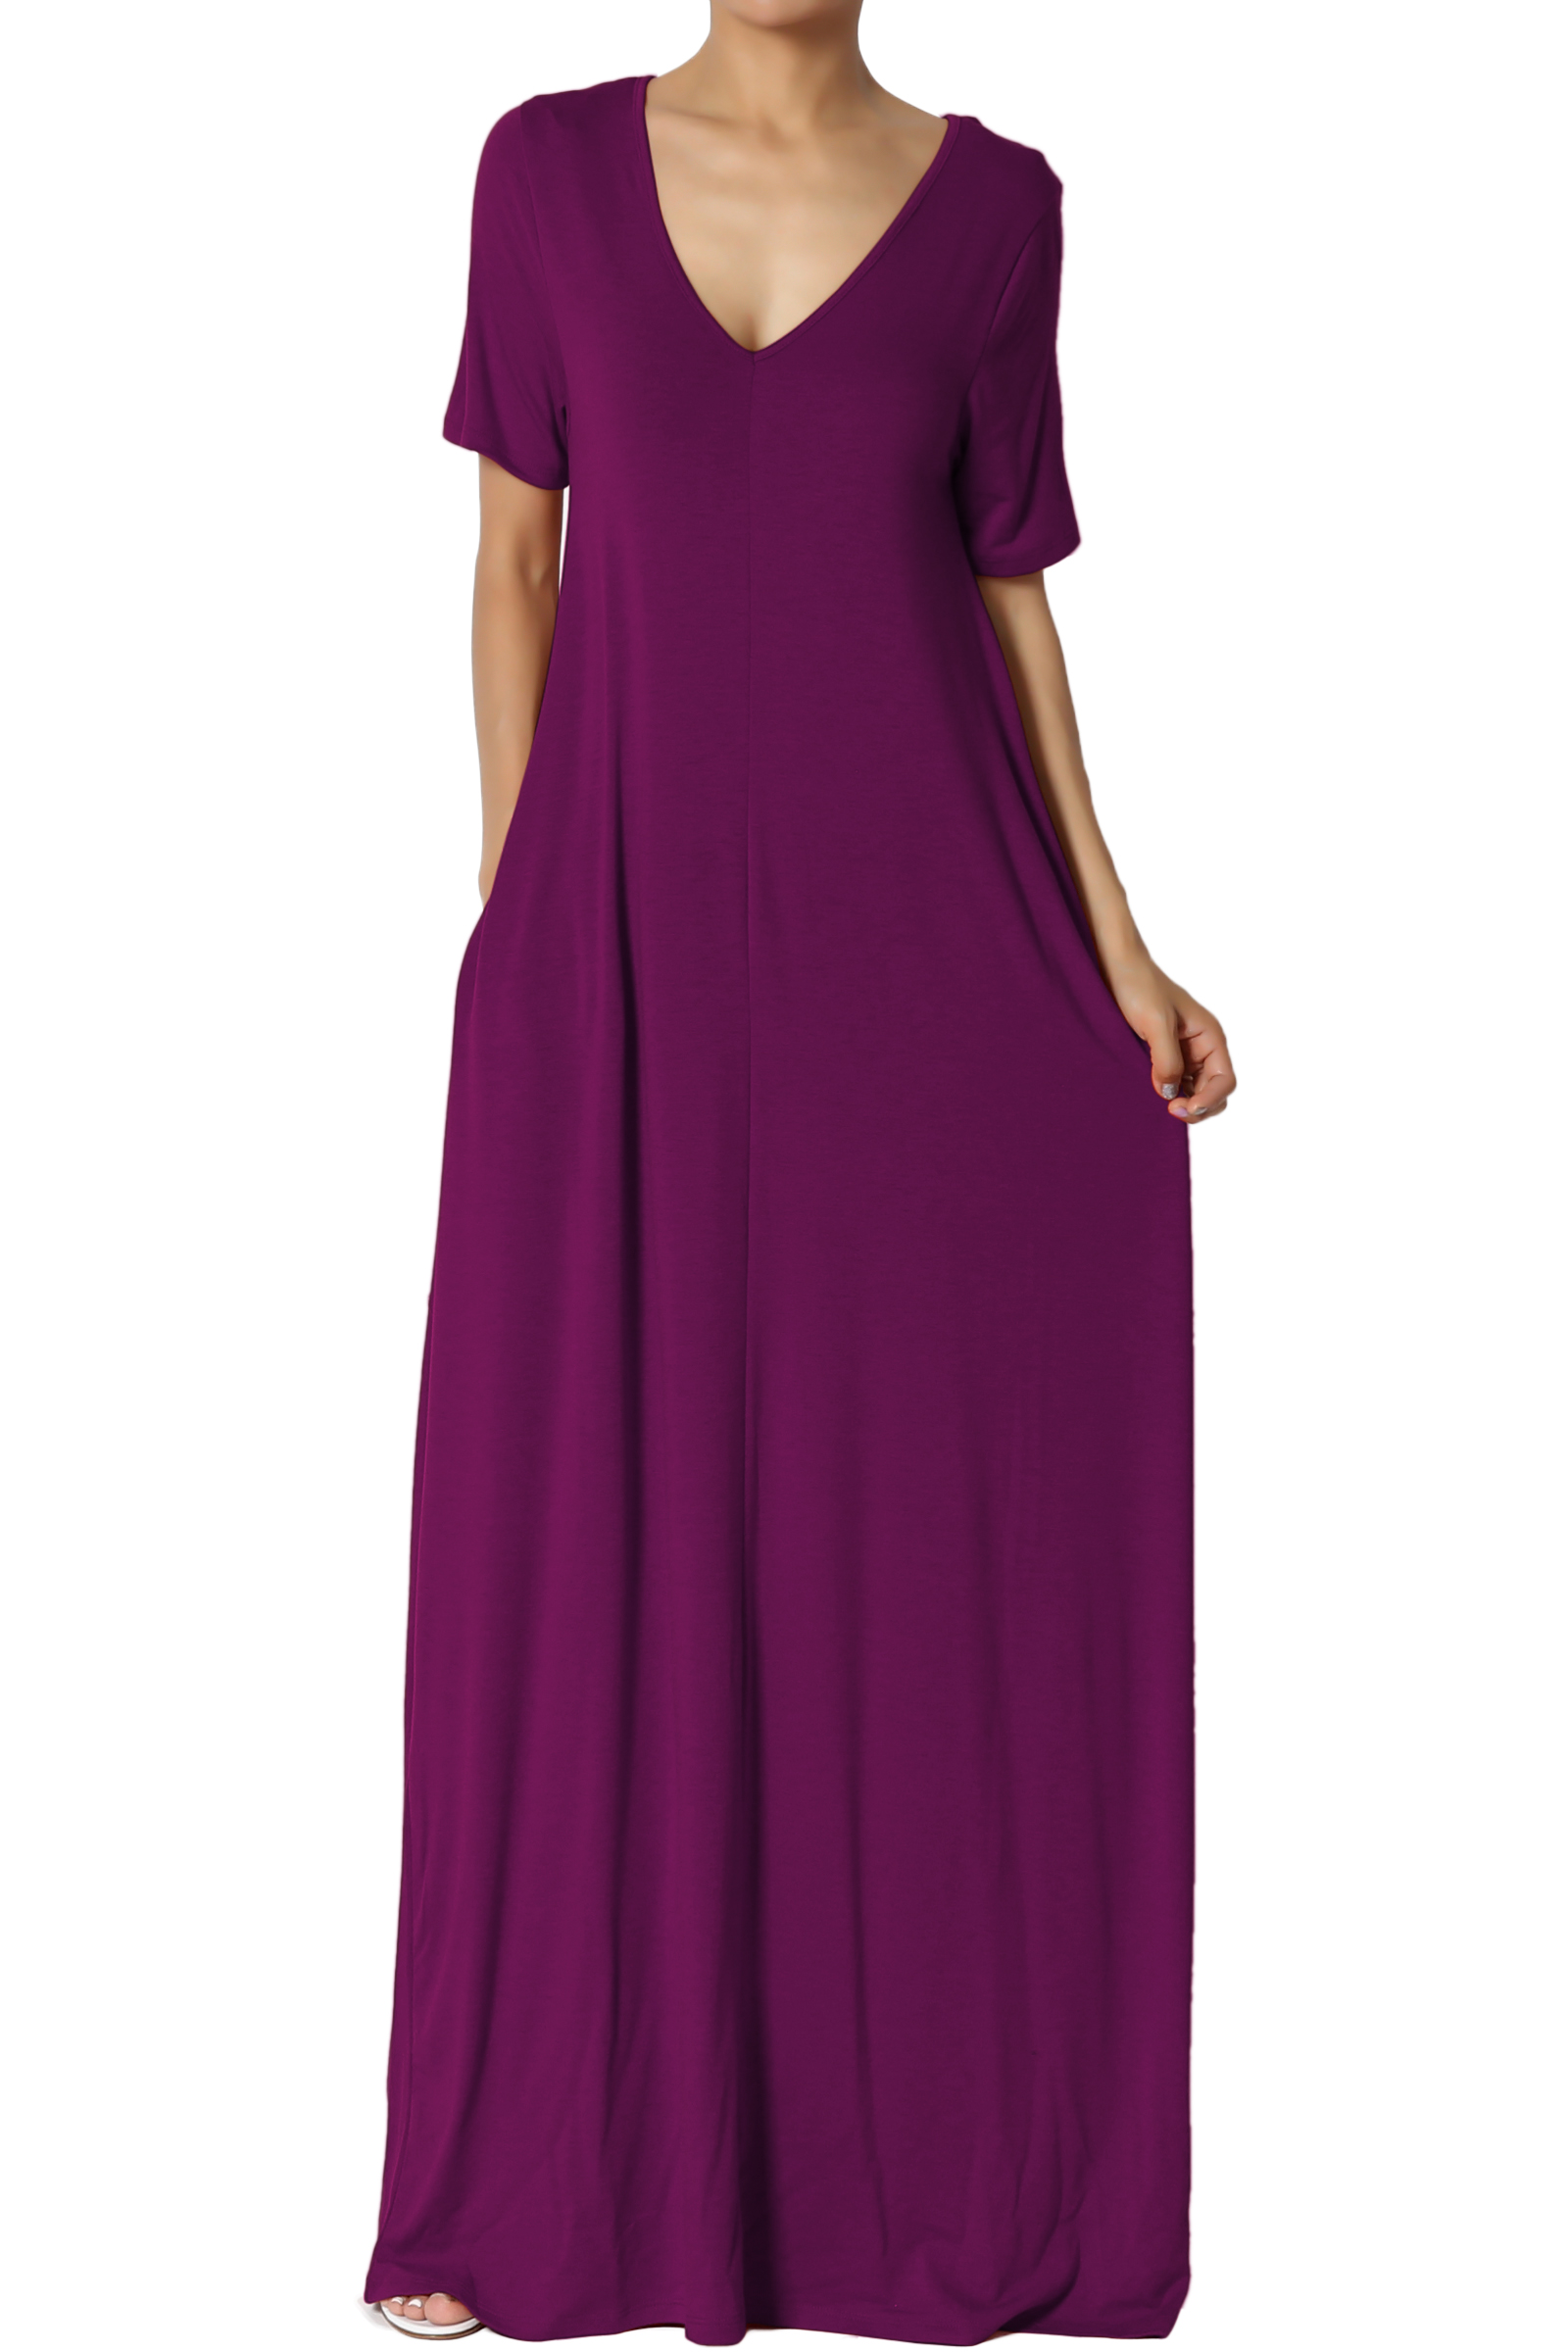 TheMogan Women's S~3X Soft Jersey Oversized V-Neck Short Sleeve Maxi Dress W Pocket